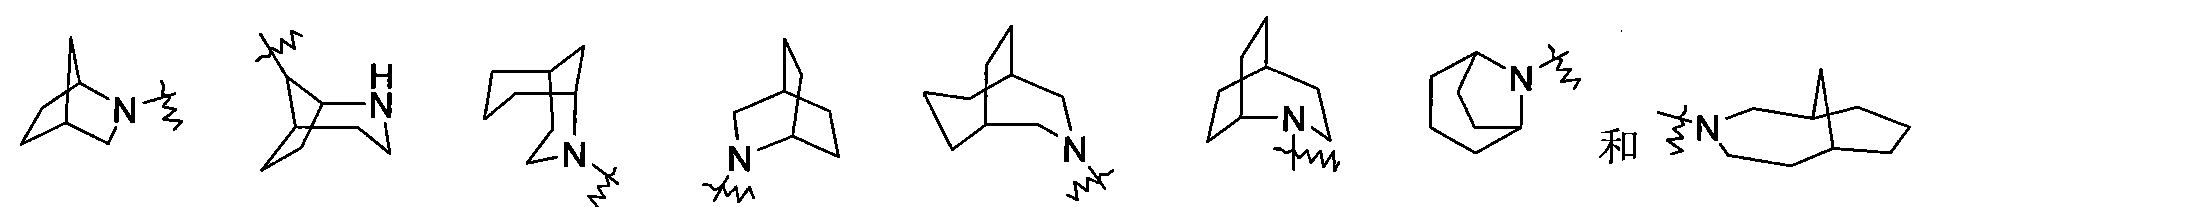 Figure CN102372722AD00153